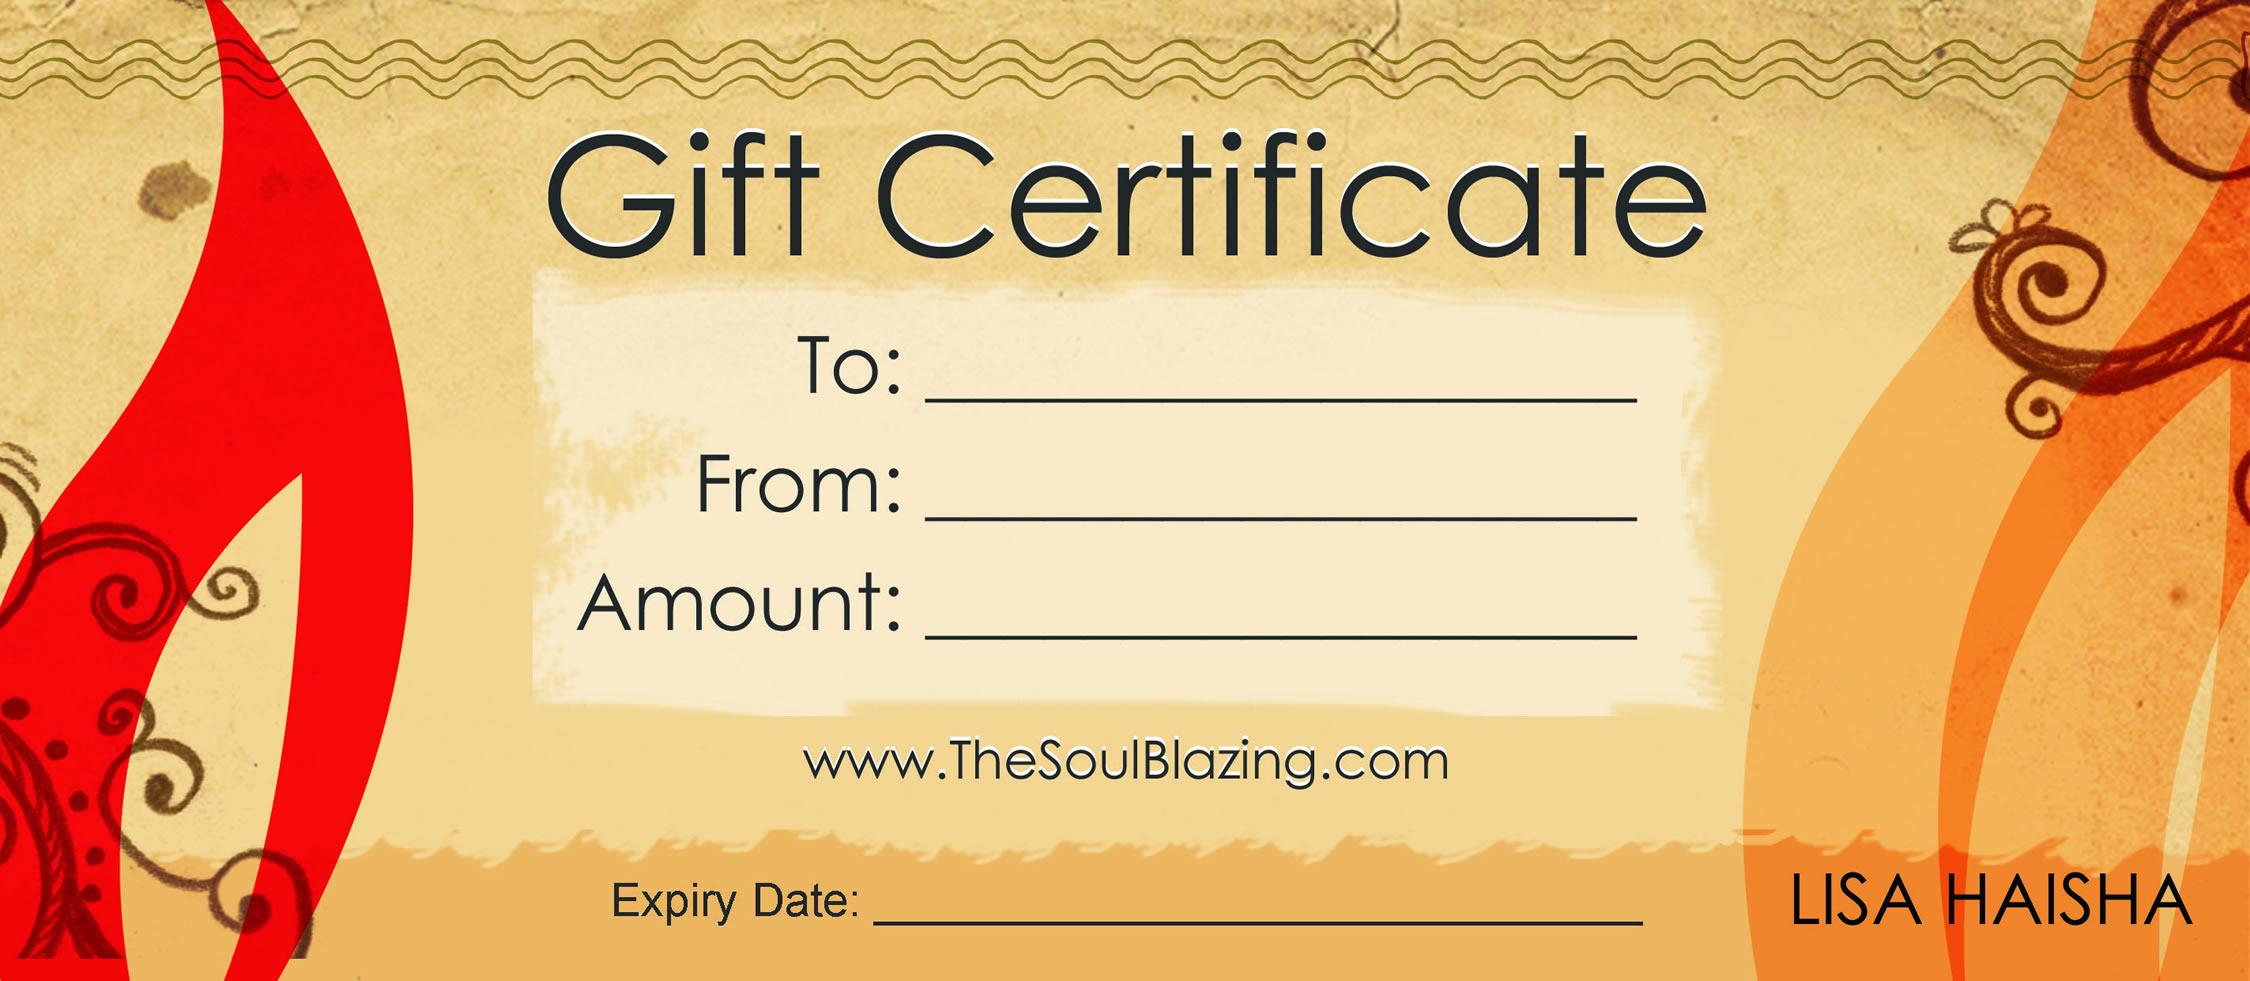 gift certificate blank template resume builder gift certificate blank template gift certificate template and tracking log vertex42 gift certificates printing